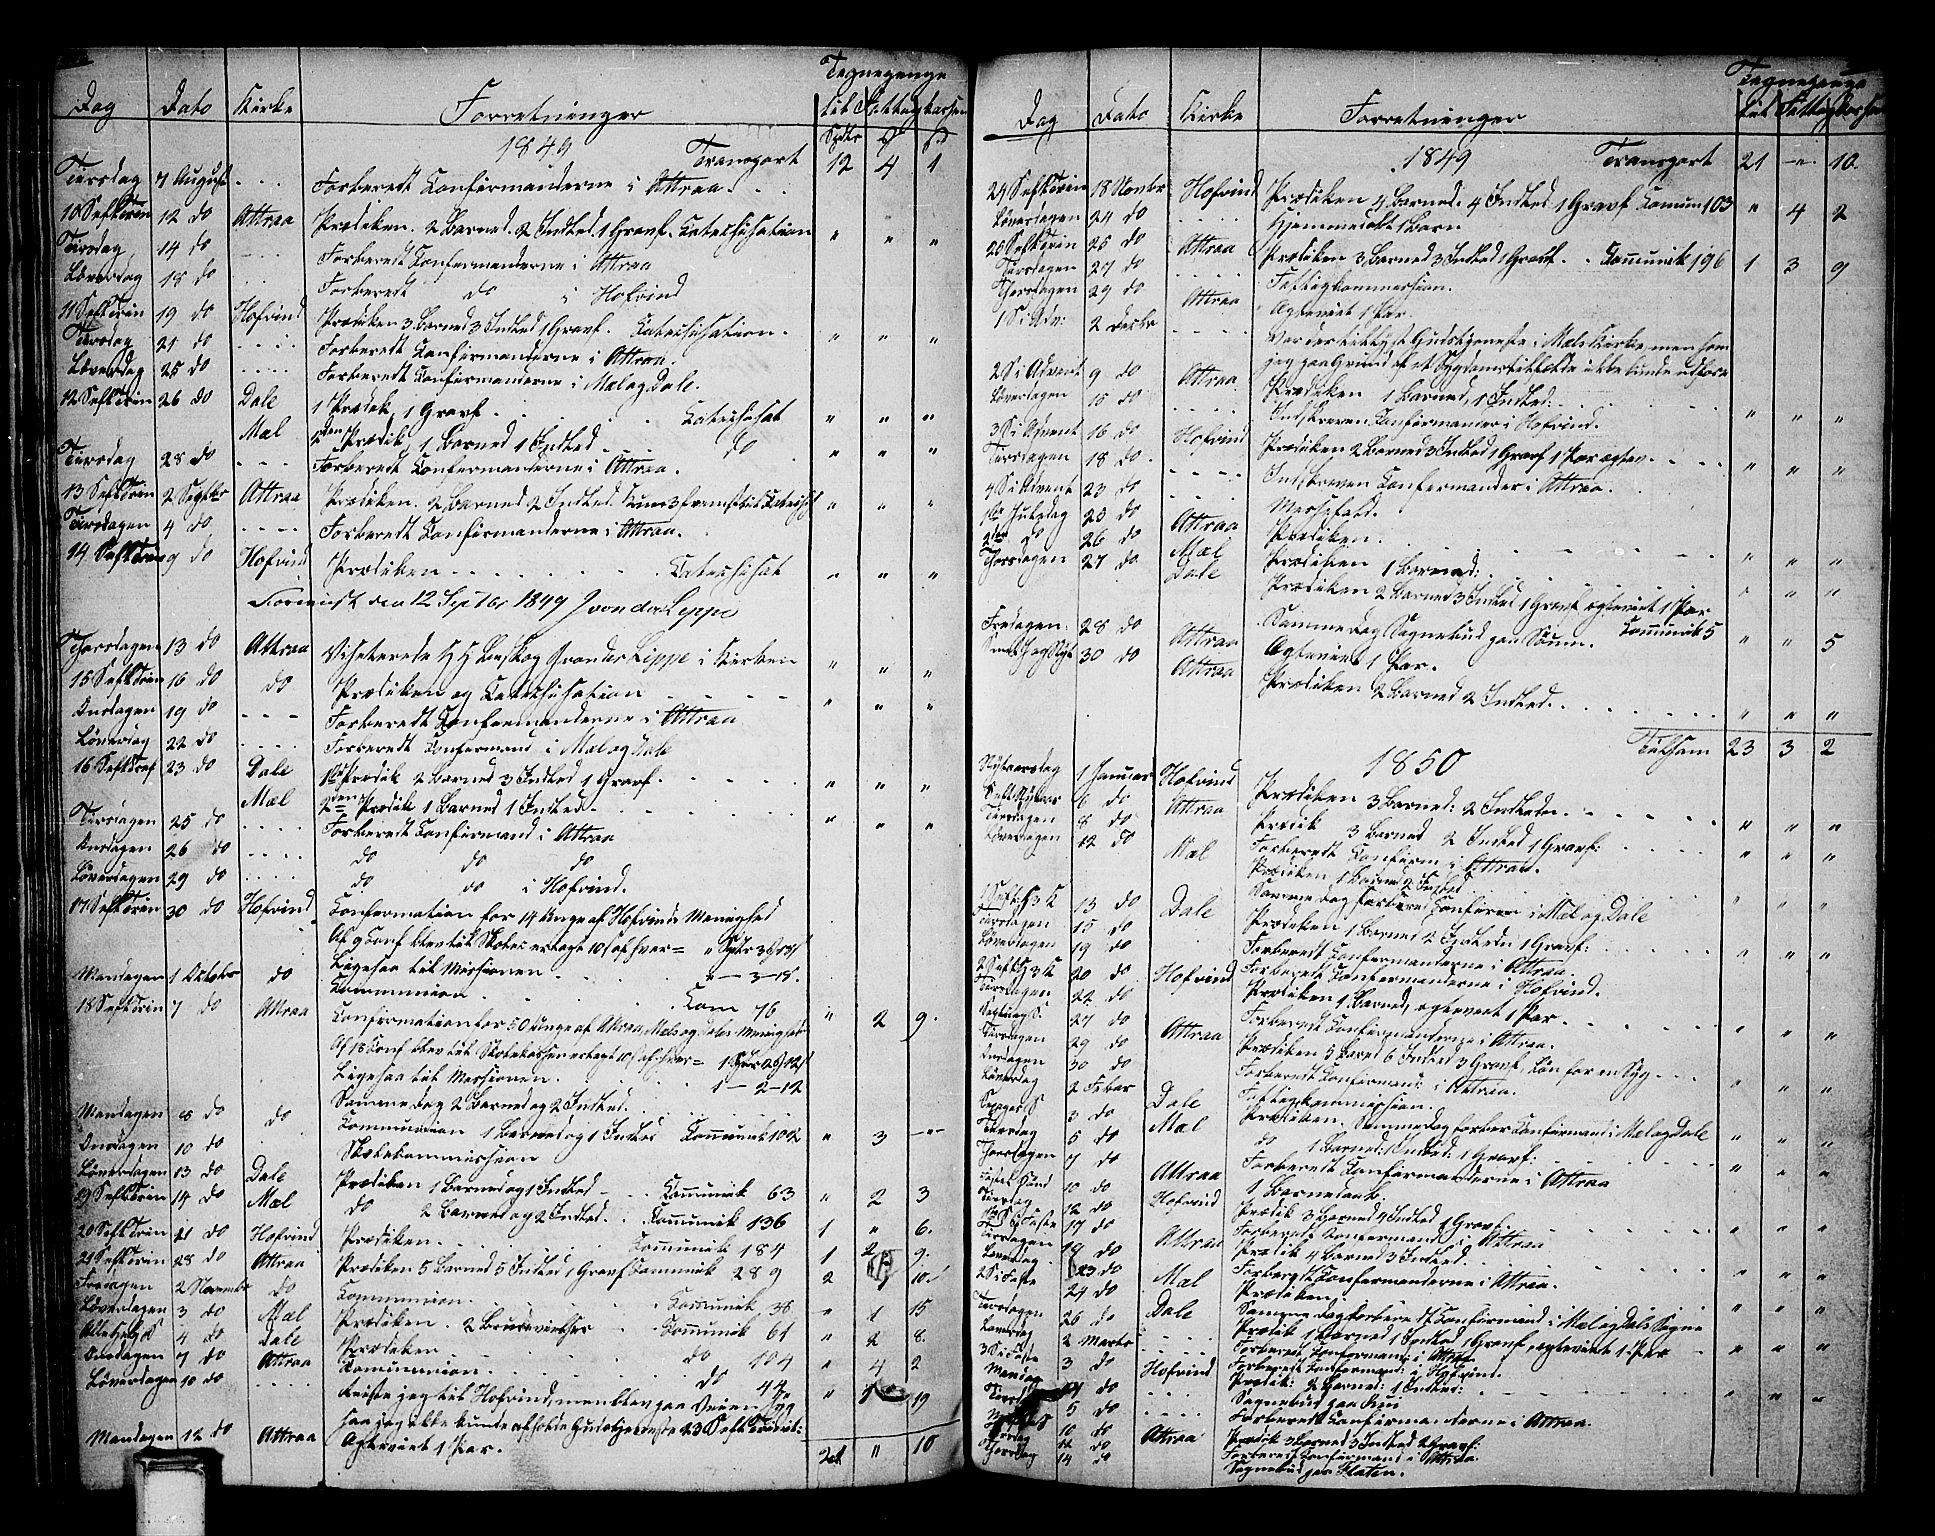 SAKO, Tinn kirkebøker, F/Fa/L0003: Ministerialbok nr. I 3, 1810-1814, s. 202-203